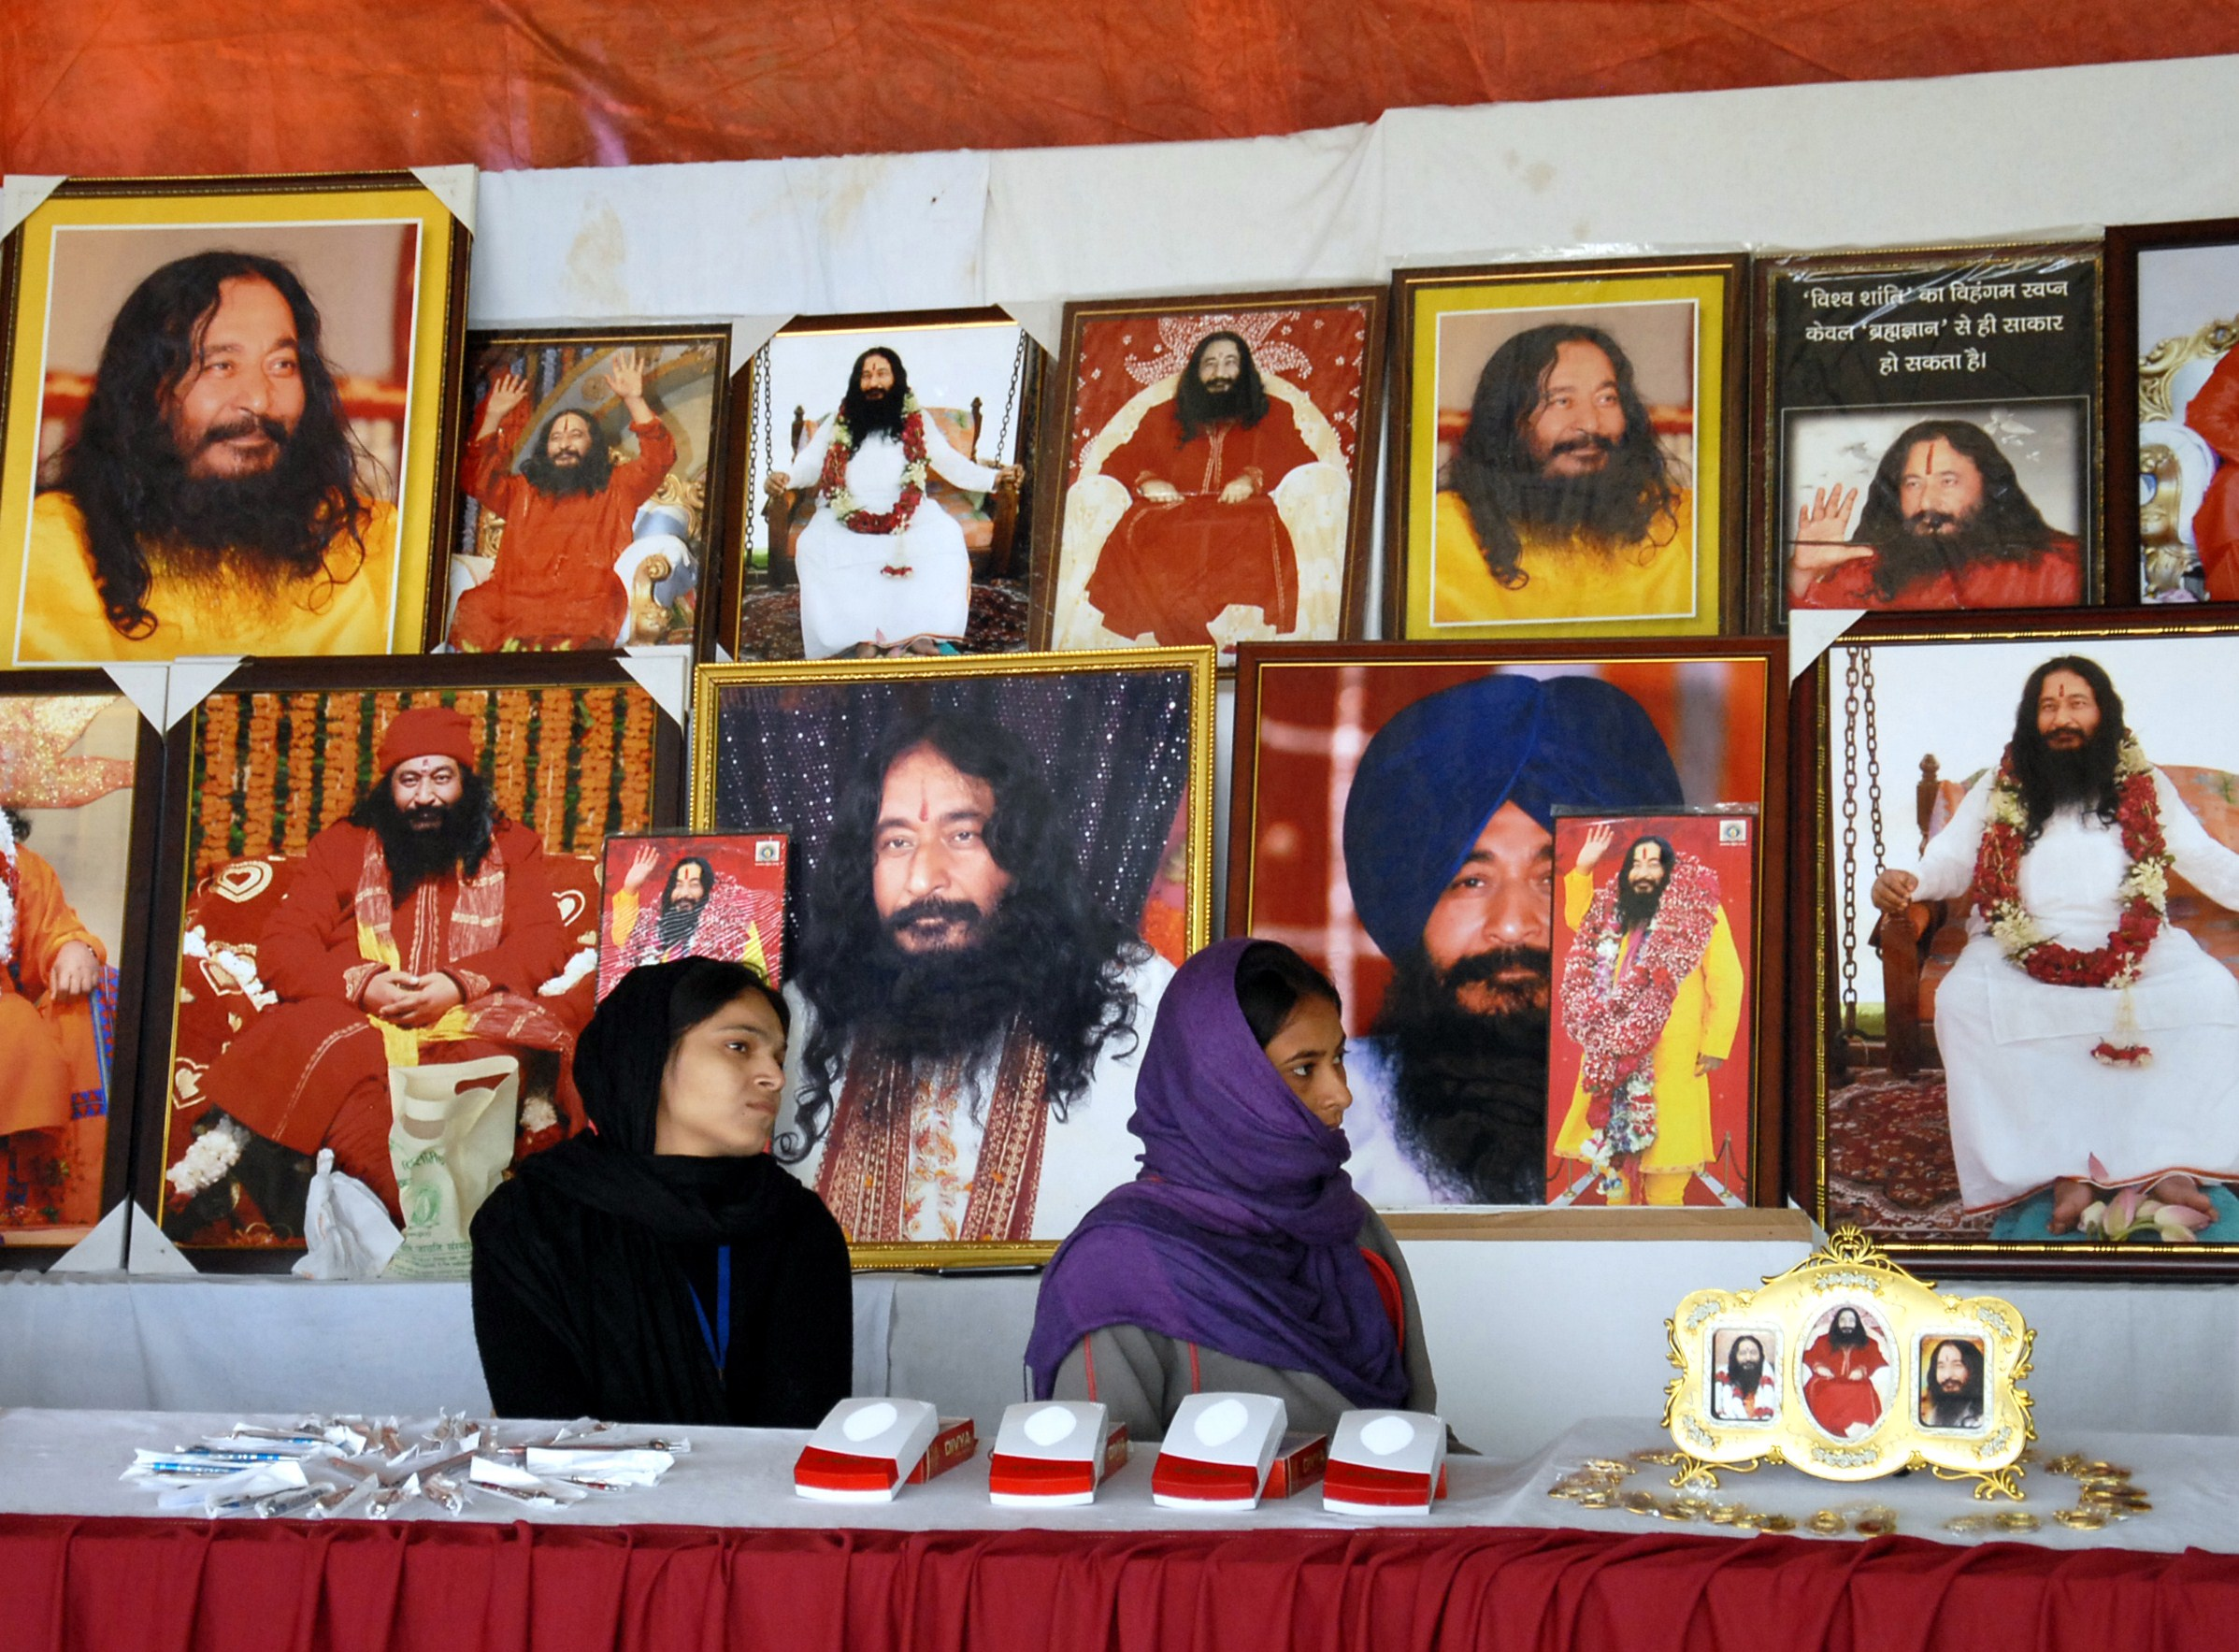 Indian followers of deceased guru Ashutosh Maharaj Divya Jyoti Jagriti Sansthaan sit front posters bearing his image on Dec. 14, 2014.